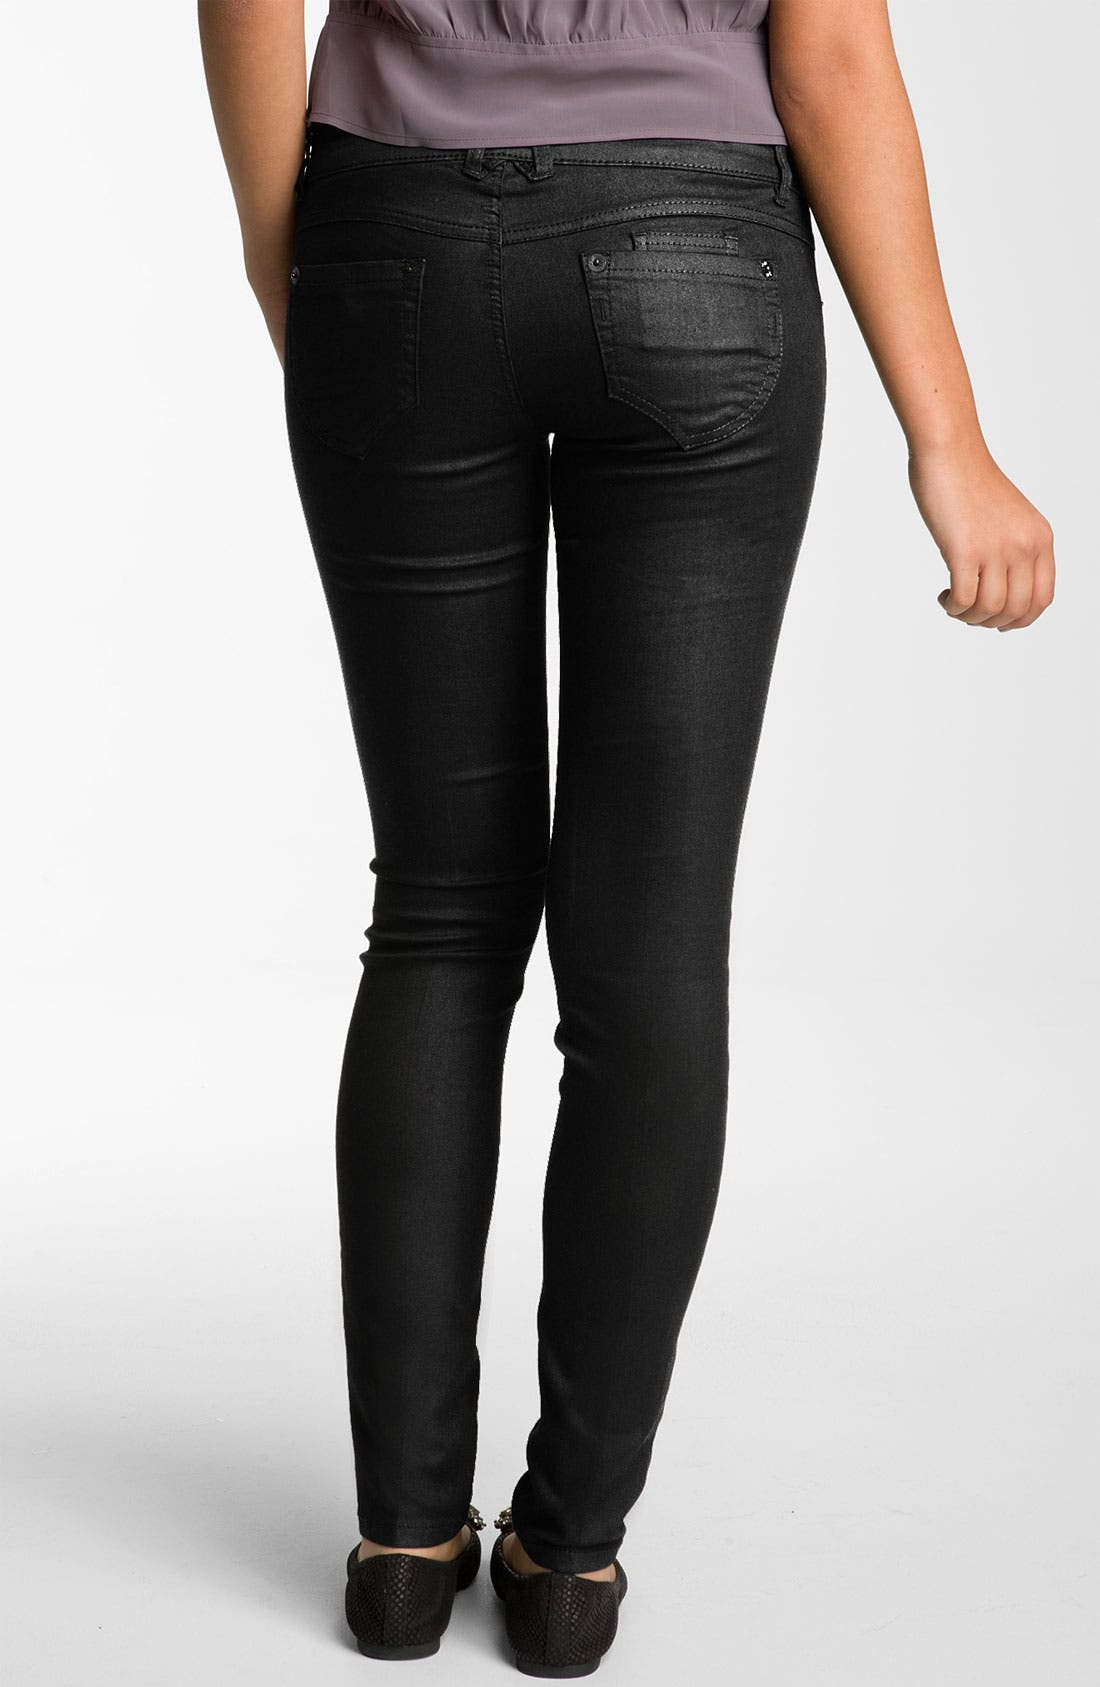 Alternate Image 1 Selected - Jolt Skinny Coated Jeans (Juniors)